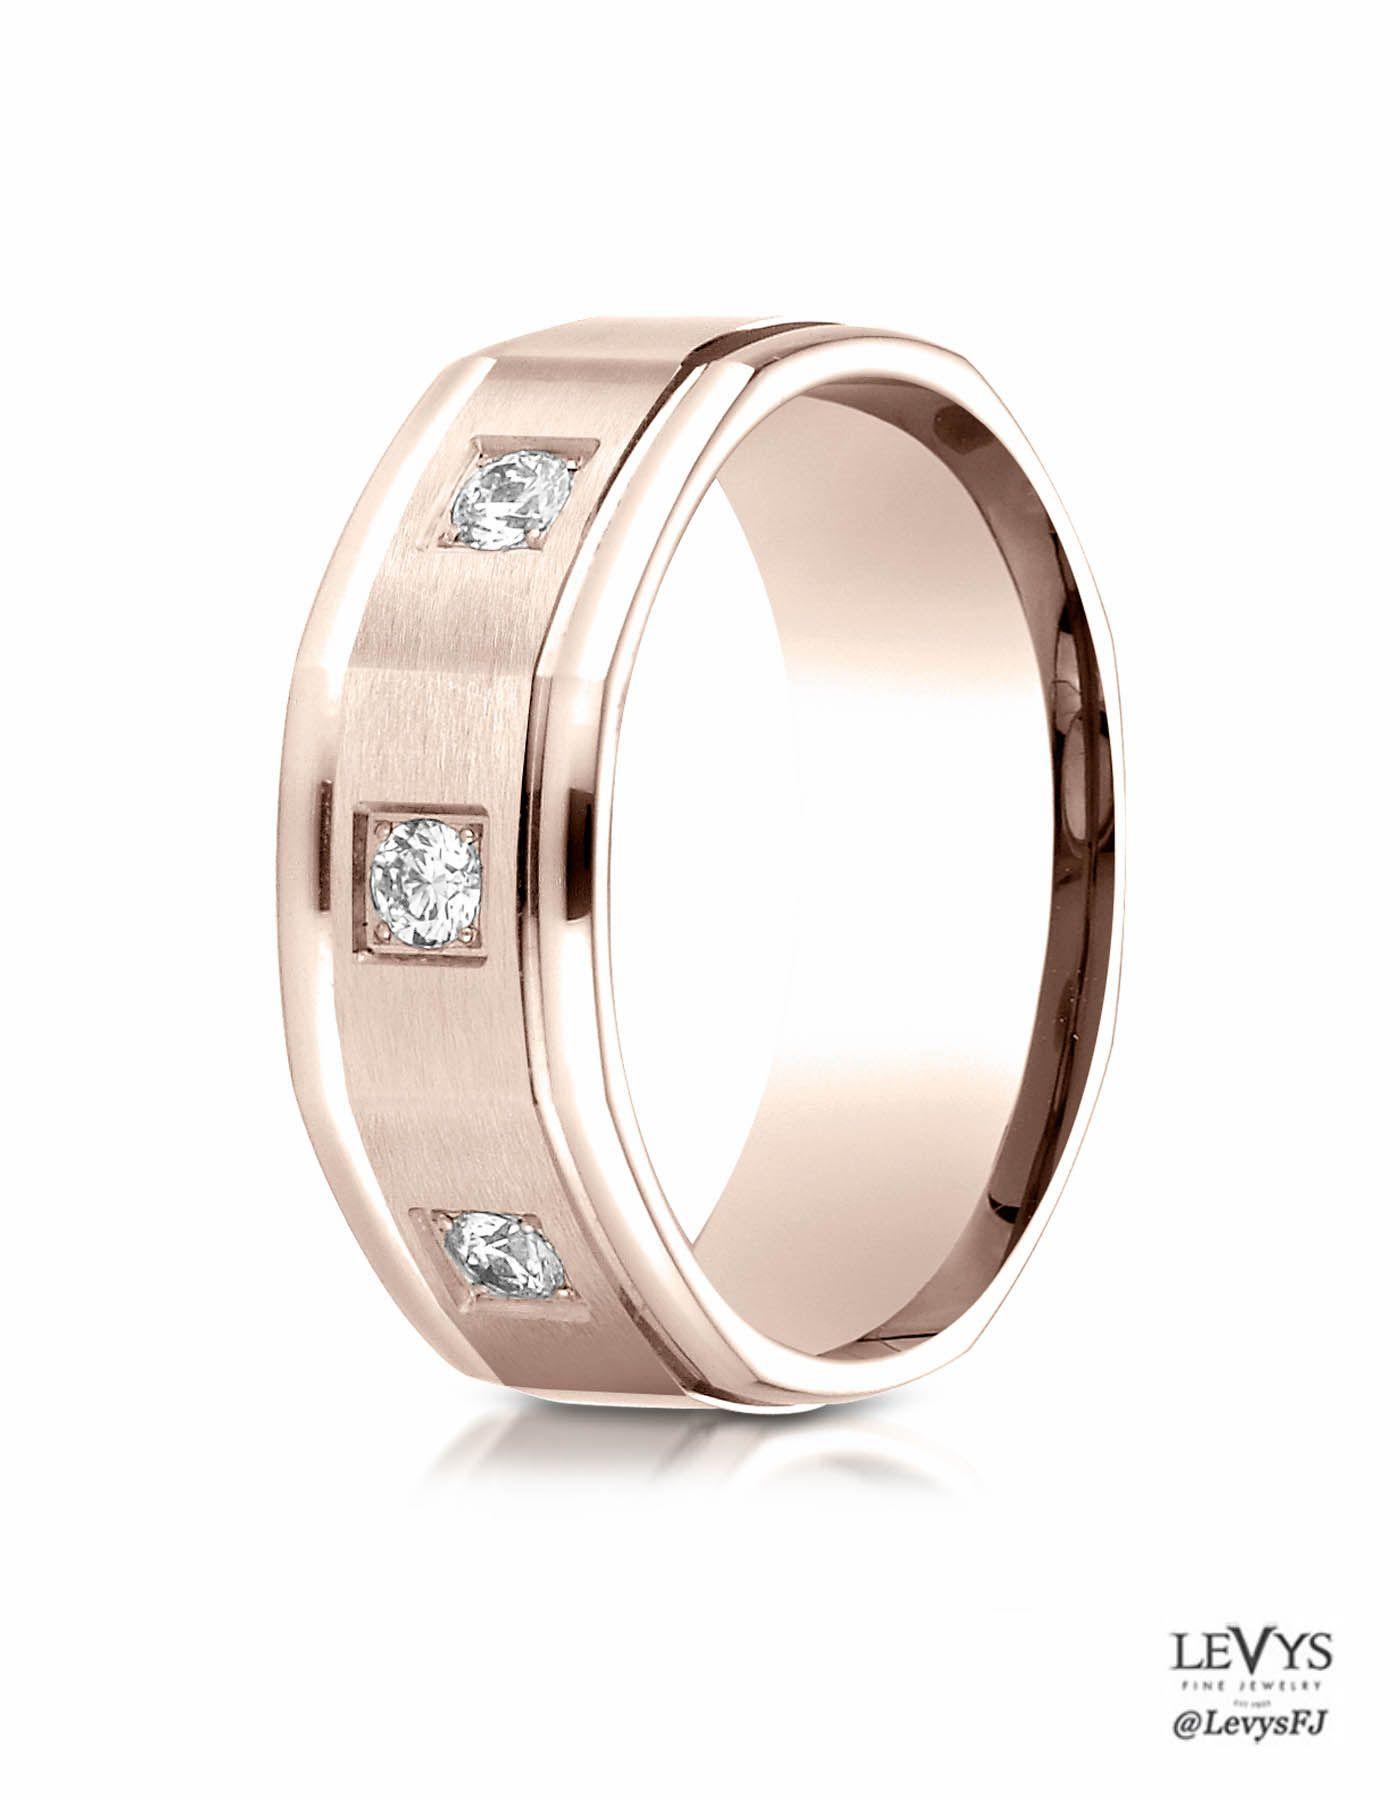 RECF528139_R_tq #Benchmark #weddingring #diamonds